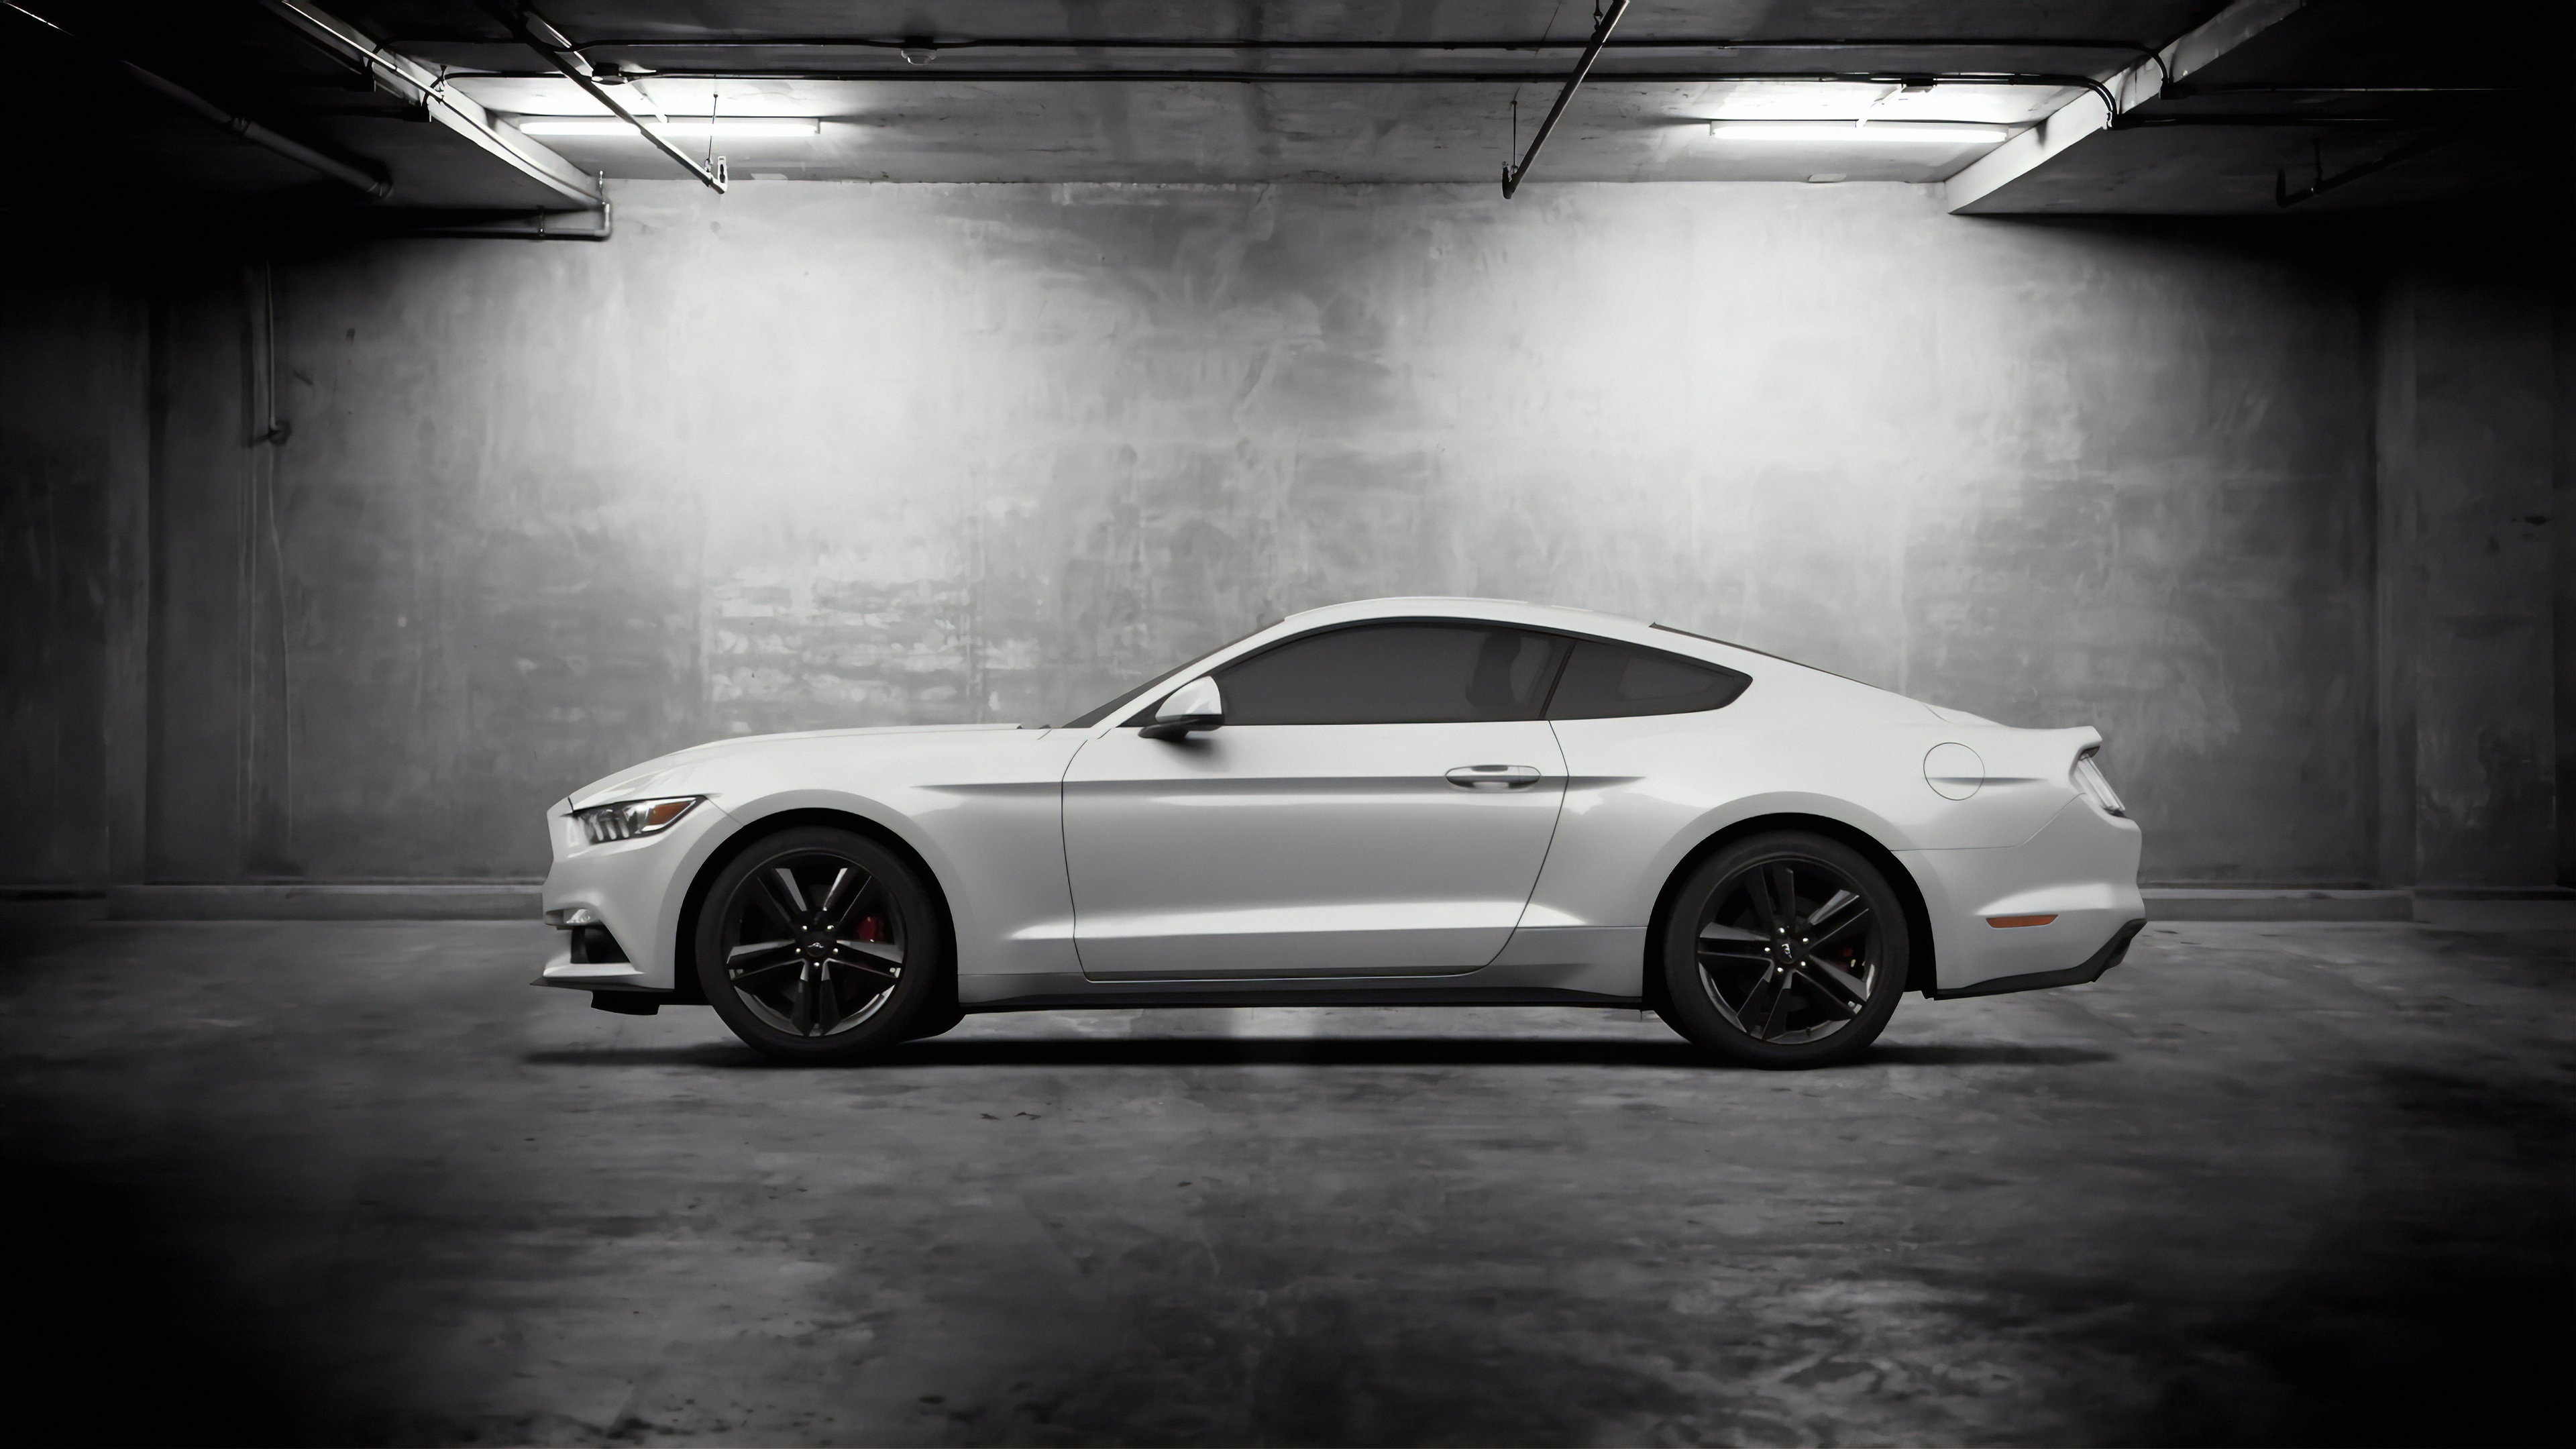 mustang 1569188388 - Mustang - mustang wallpapers, hd-wallpapers, ford mustang wallpapers, cars wallpapers, behance wallpapers, 4k-wallpapers, 2019 cars wallpapers